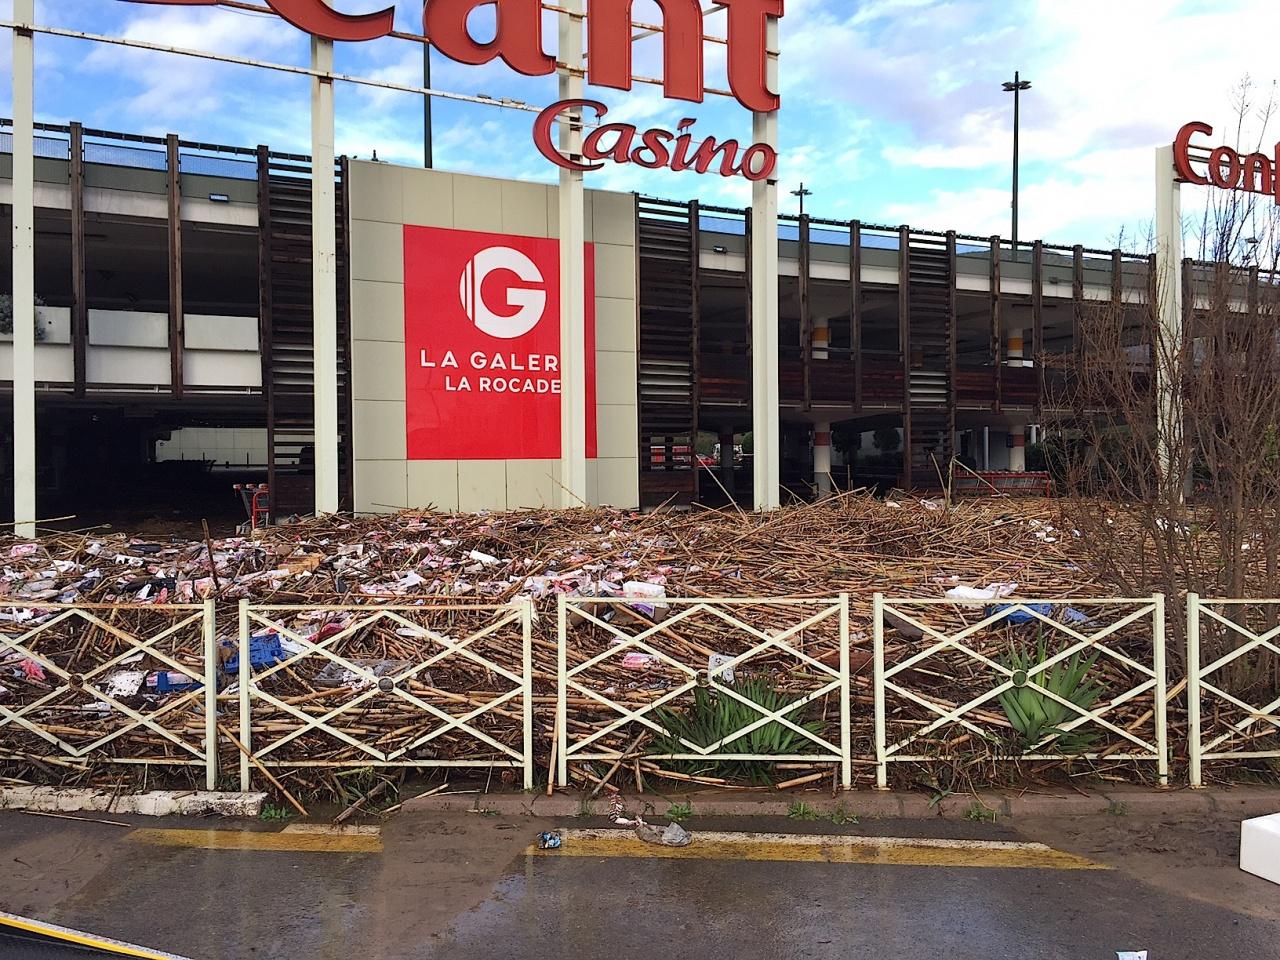 Geant casino furiani catalogue live poker satellites london